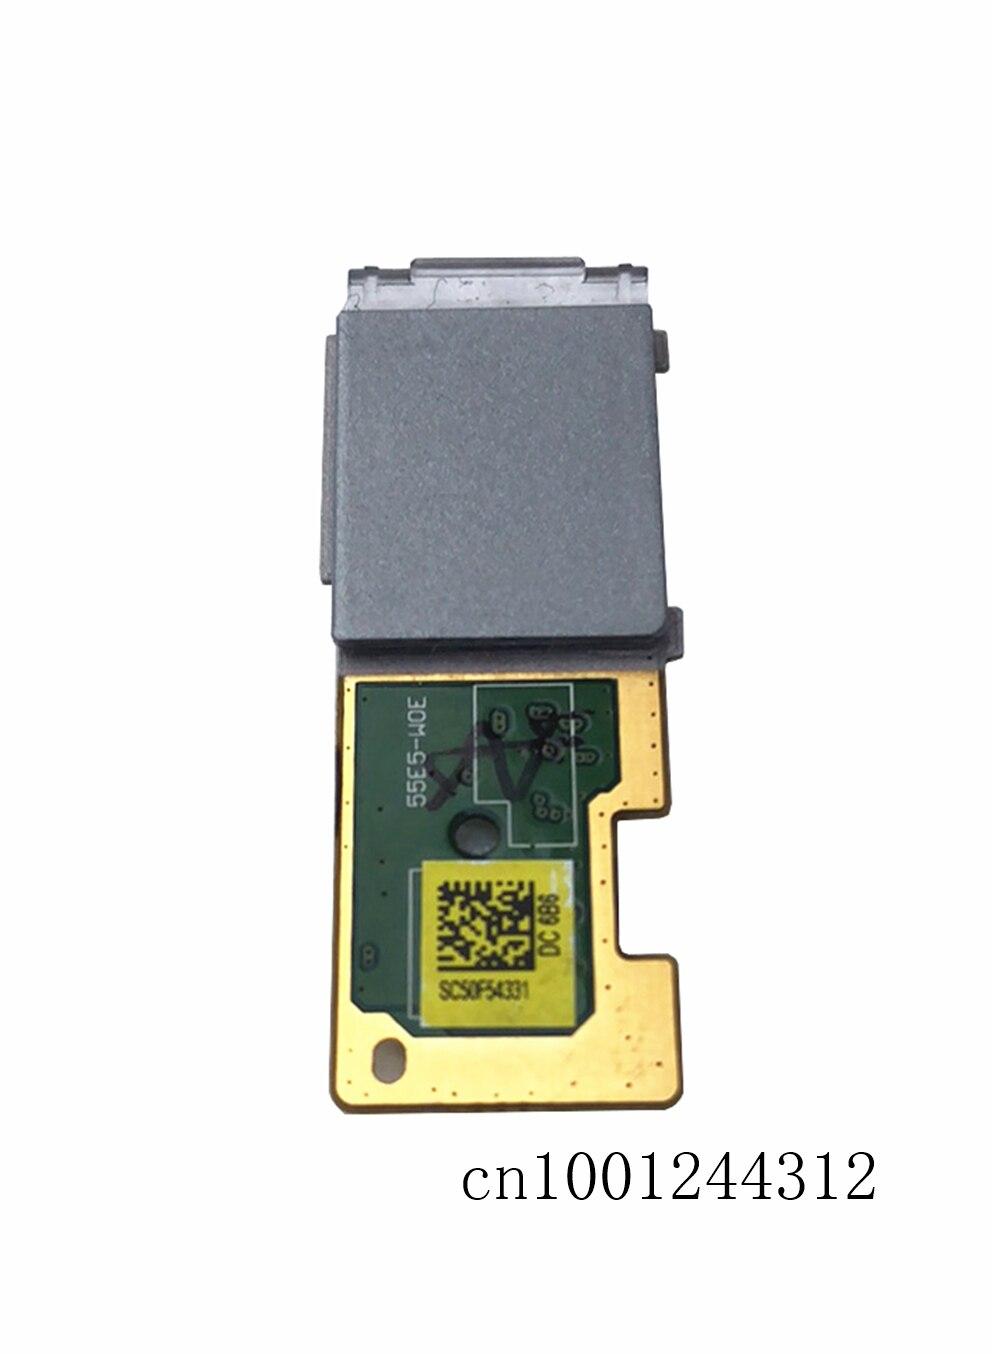 New Replacement for Lenovo Thinkpad T460S T470S Fingerprint Tray Bracket